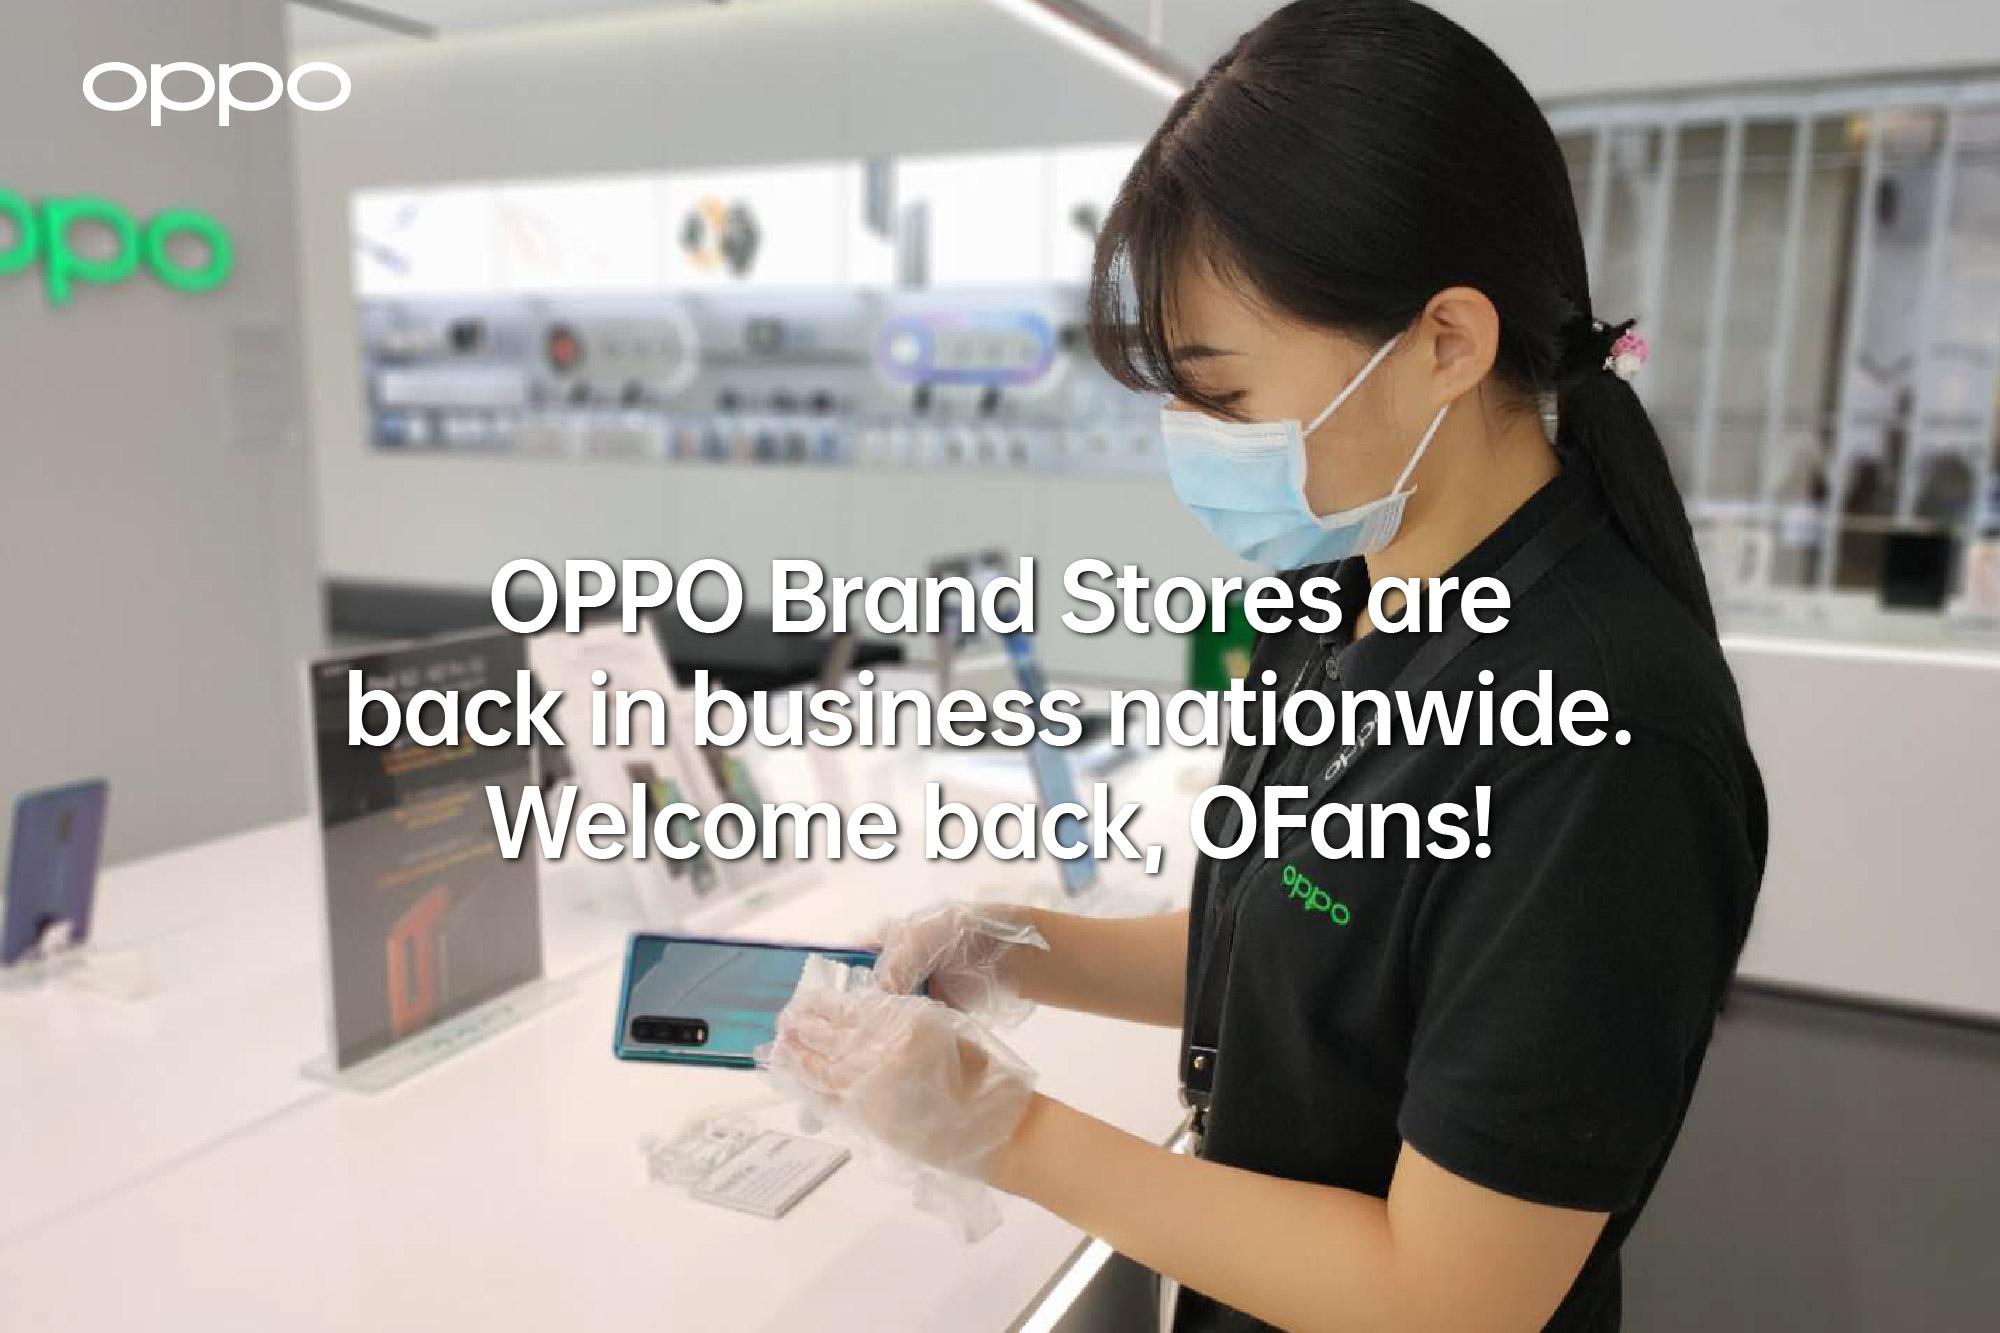 OPPO Brand Stores